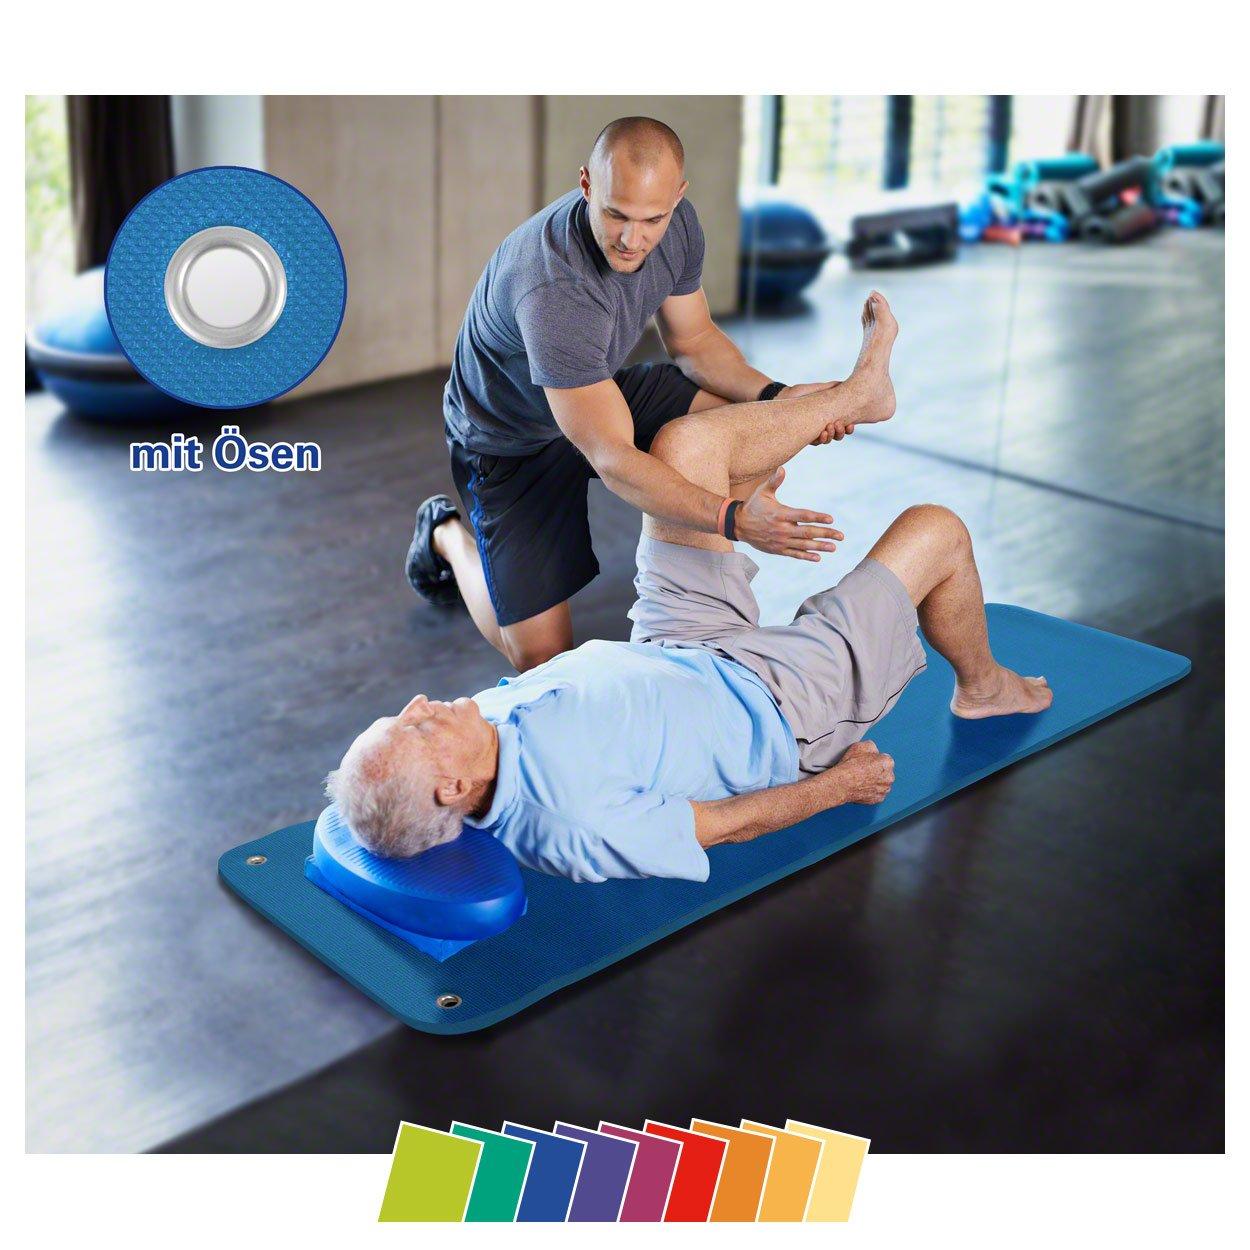 Sport-Tec Therapiematte inkl. Ösen, LxBxH 180x60x1,5 cm